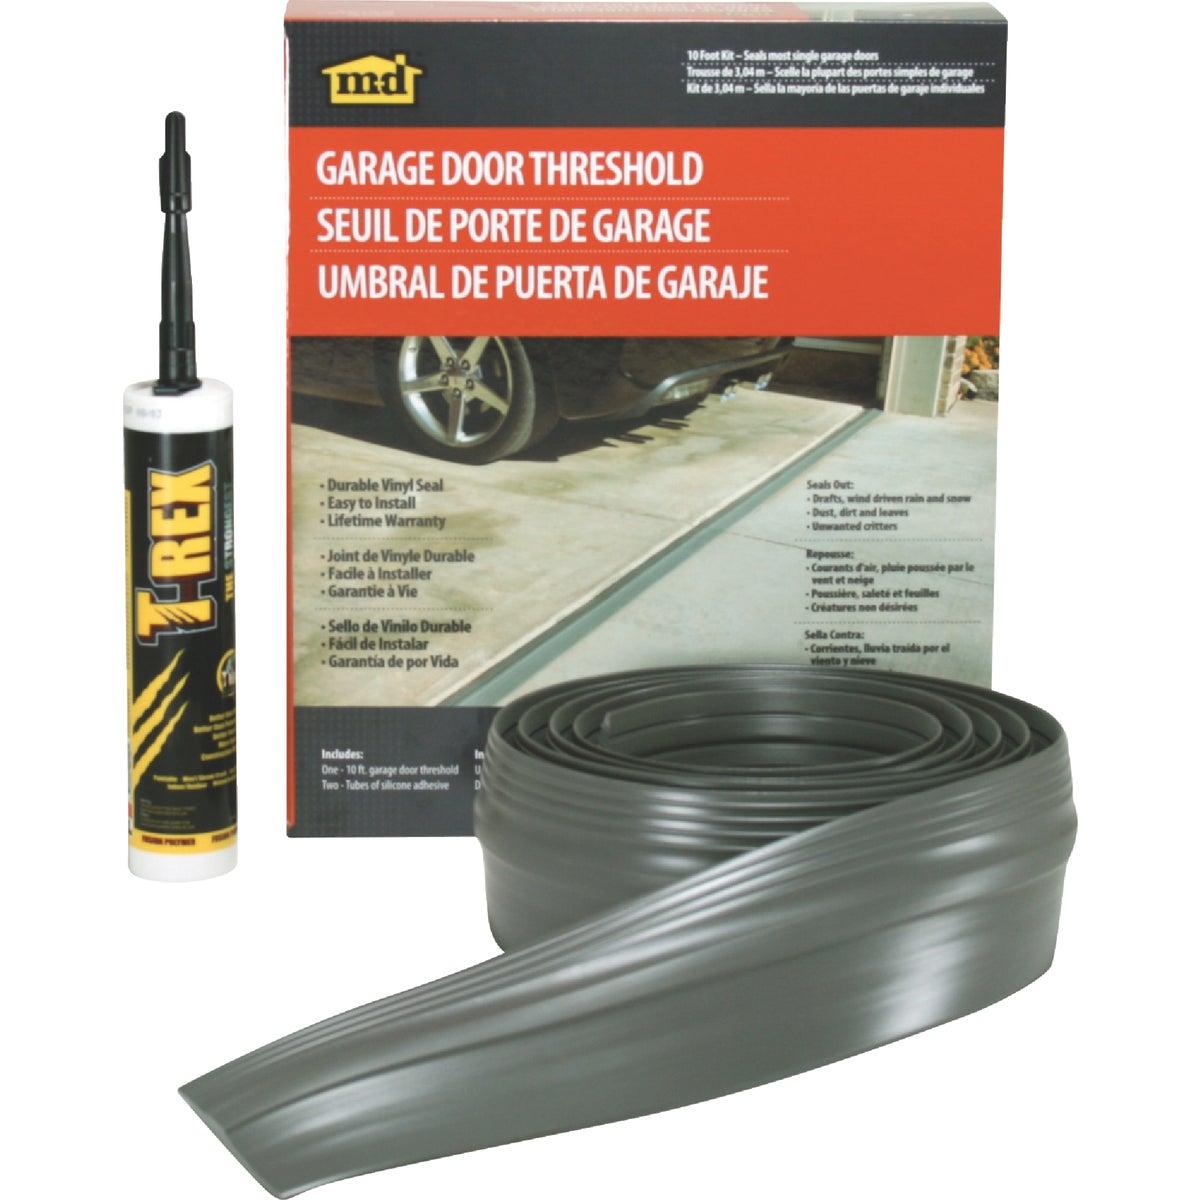 M-D Building Products 10' GAR DR THRESHOLD KIT 50100